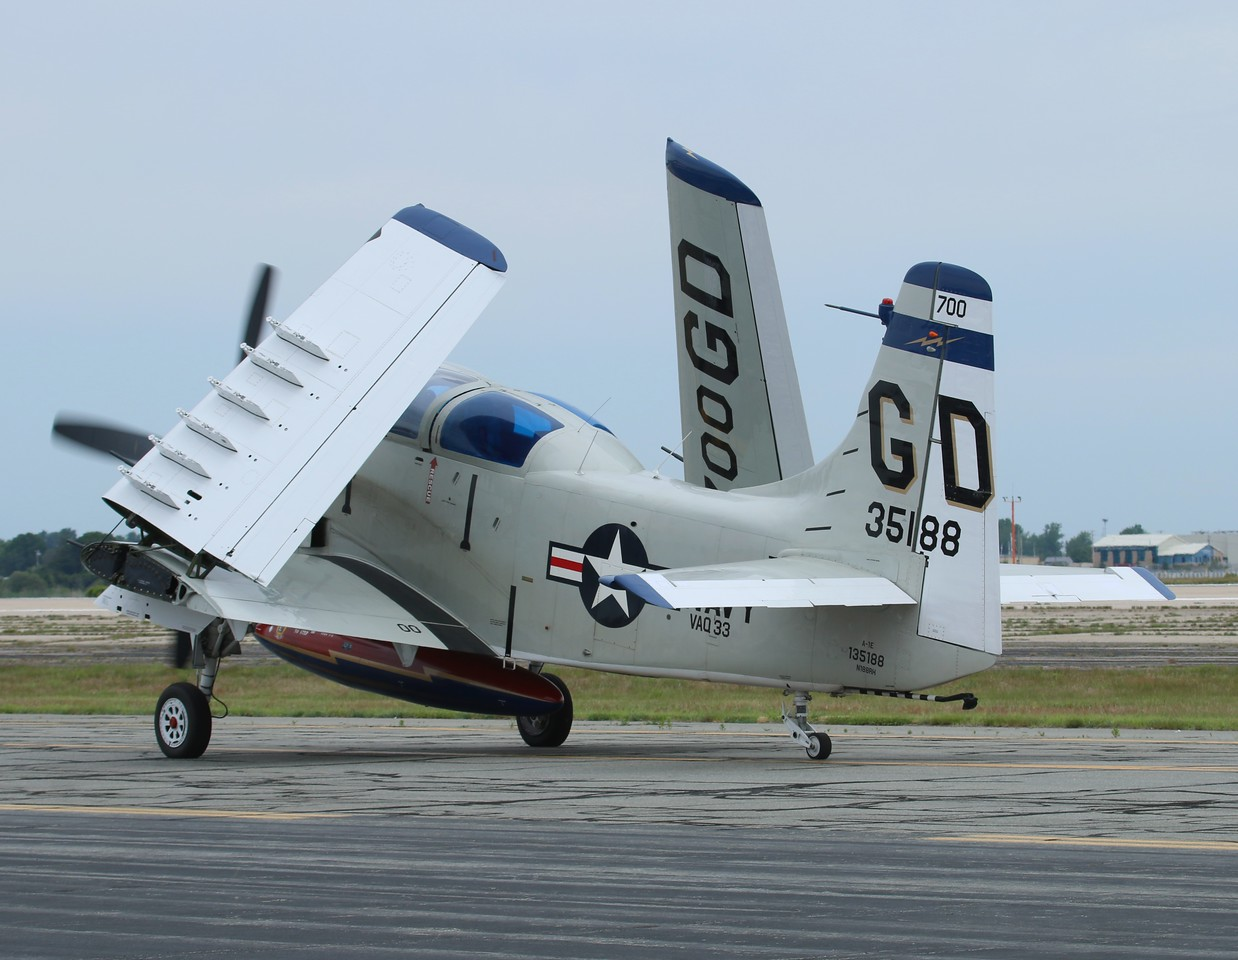 Collings Foundation A1-E Skyraider [135188] N188RH